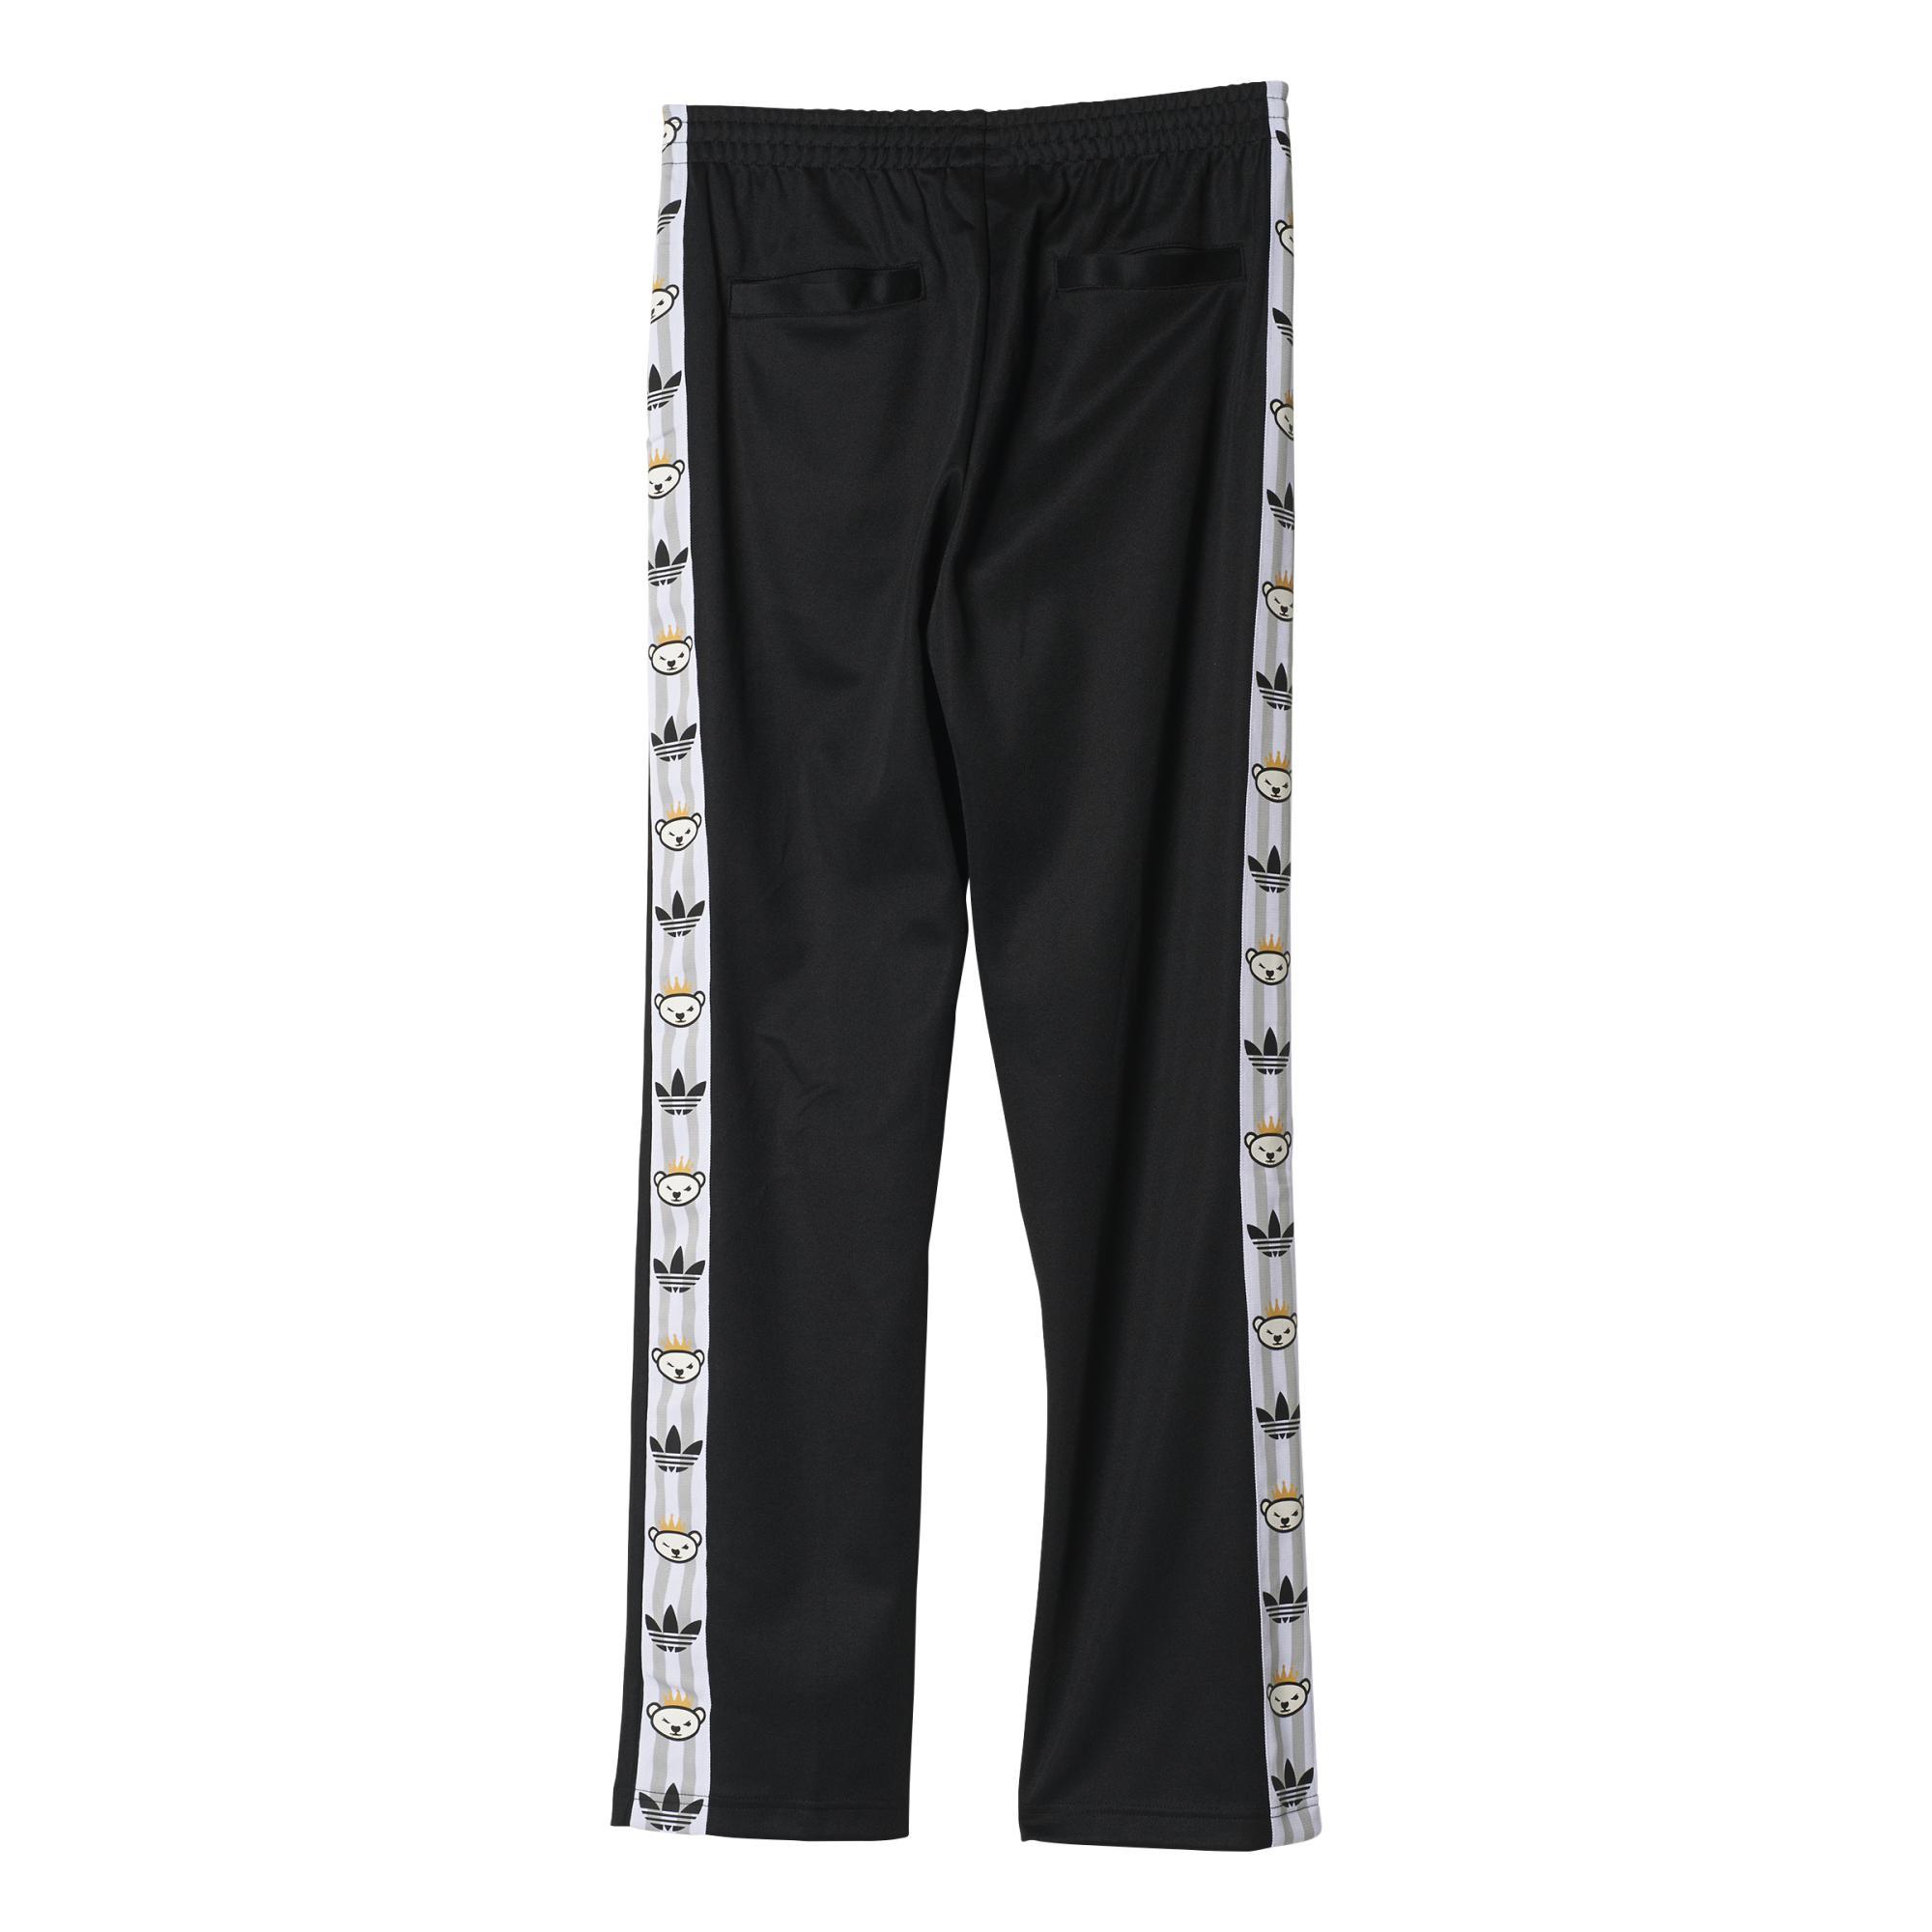 pantalon adidas originals 3 bandas